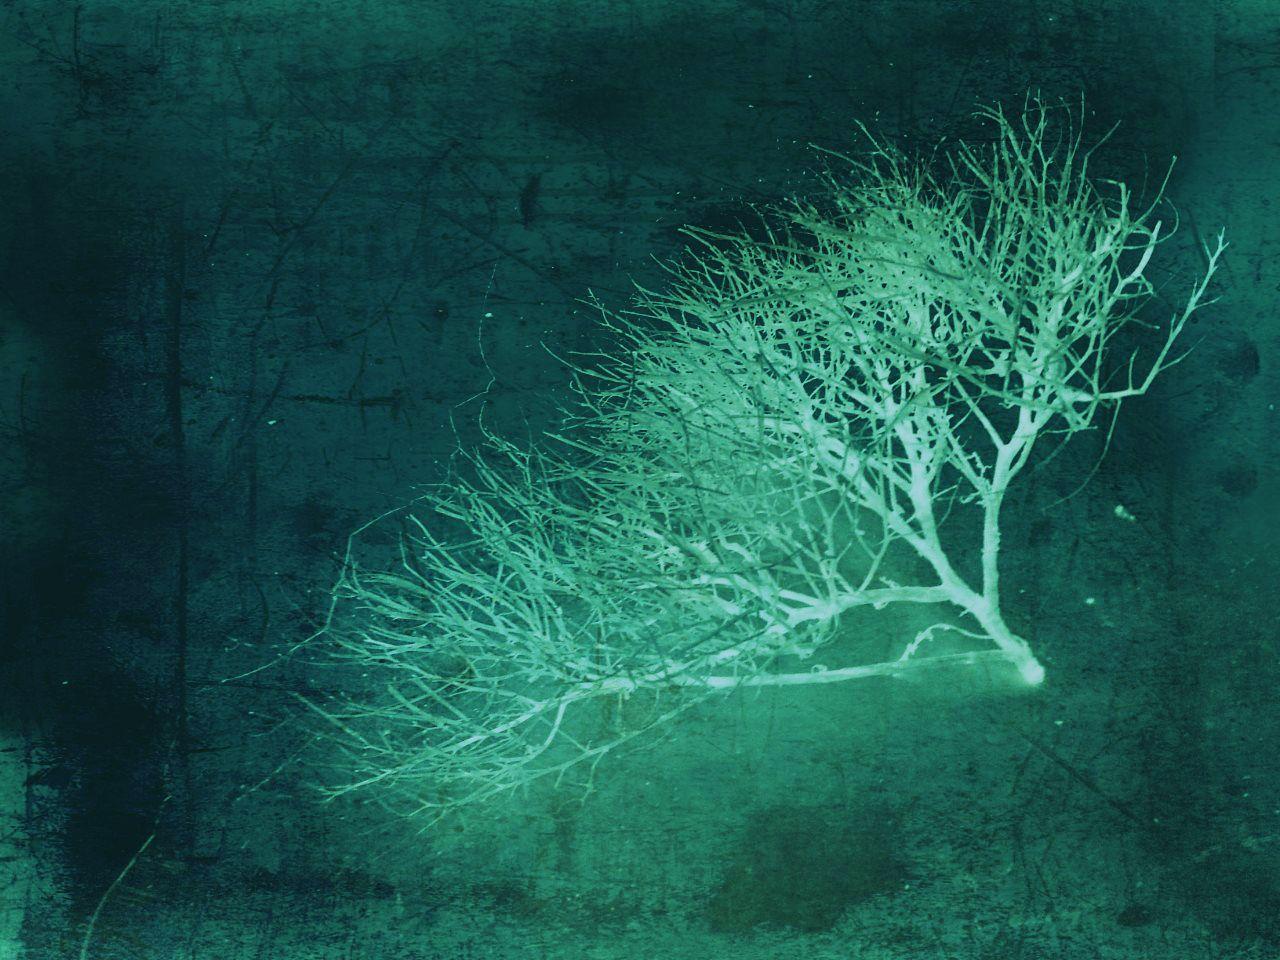 Robin Brown Photography #mood #texture #emerald